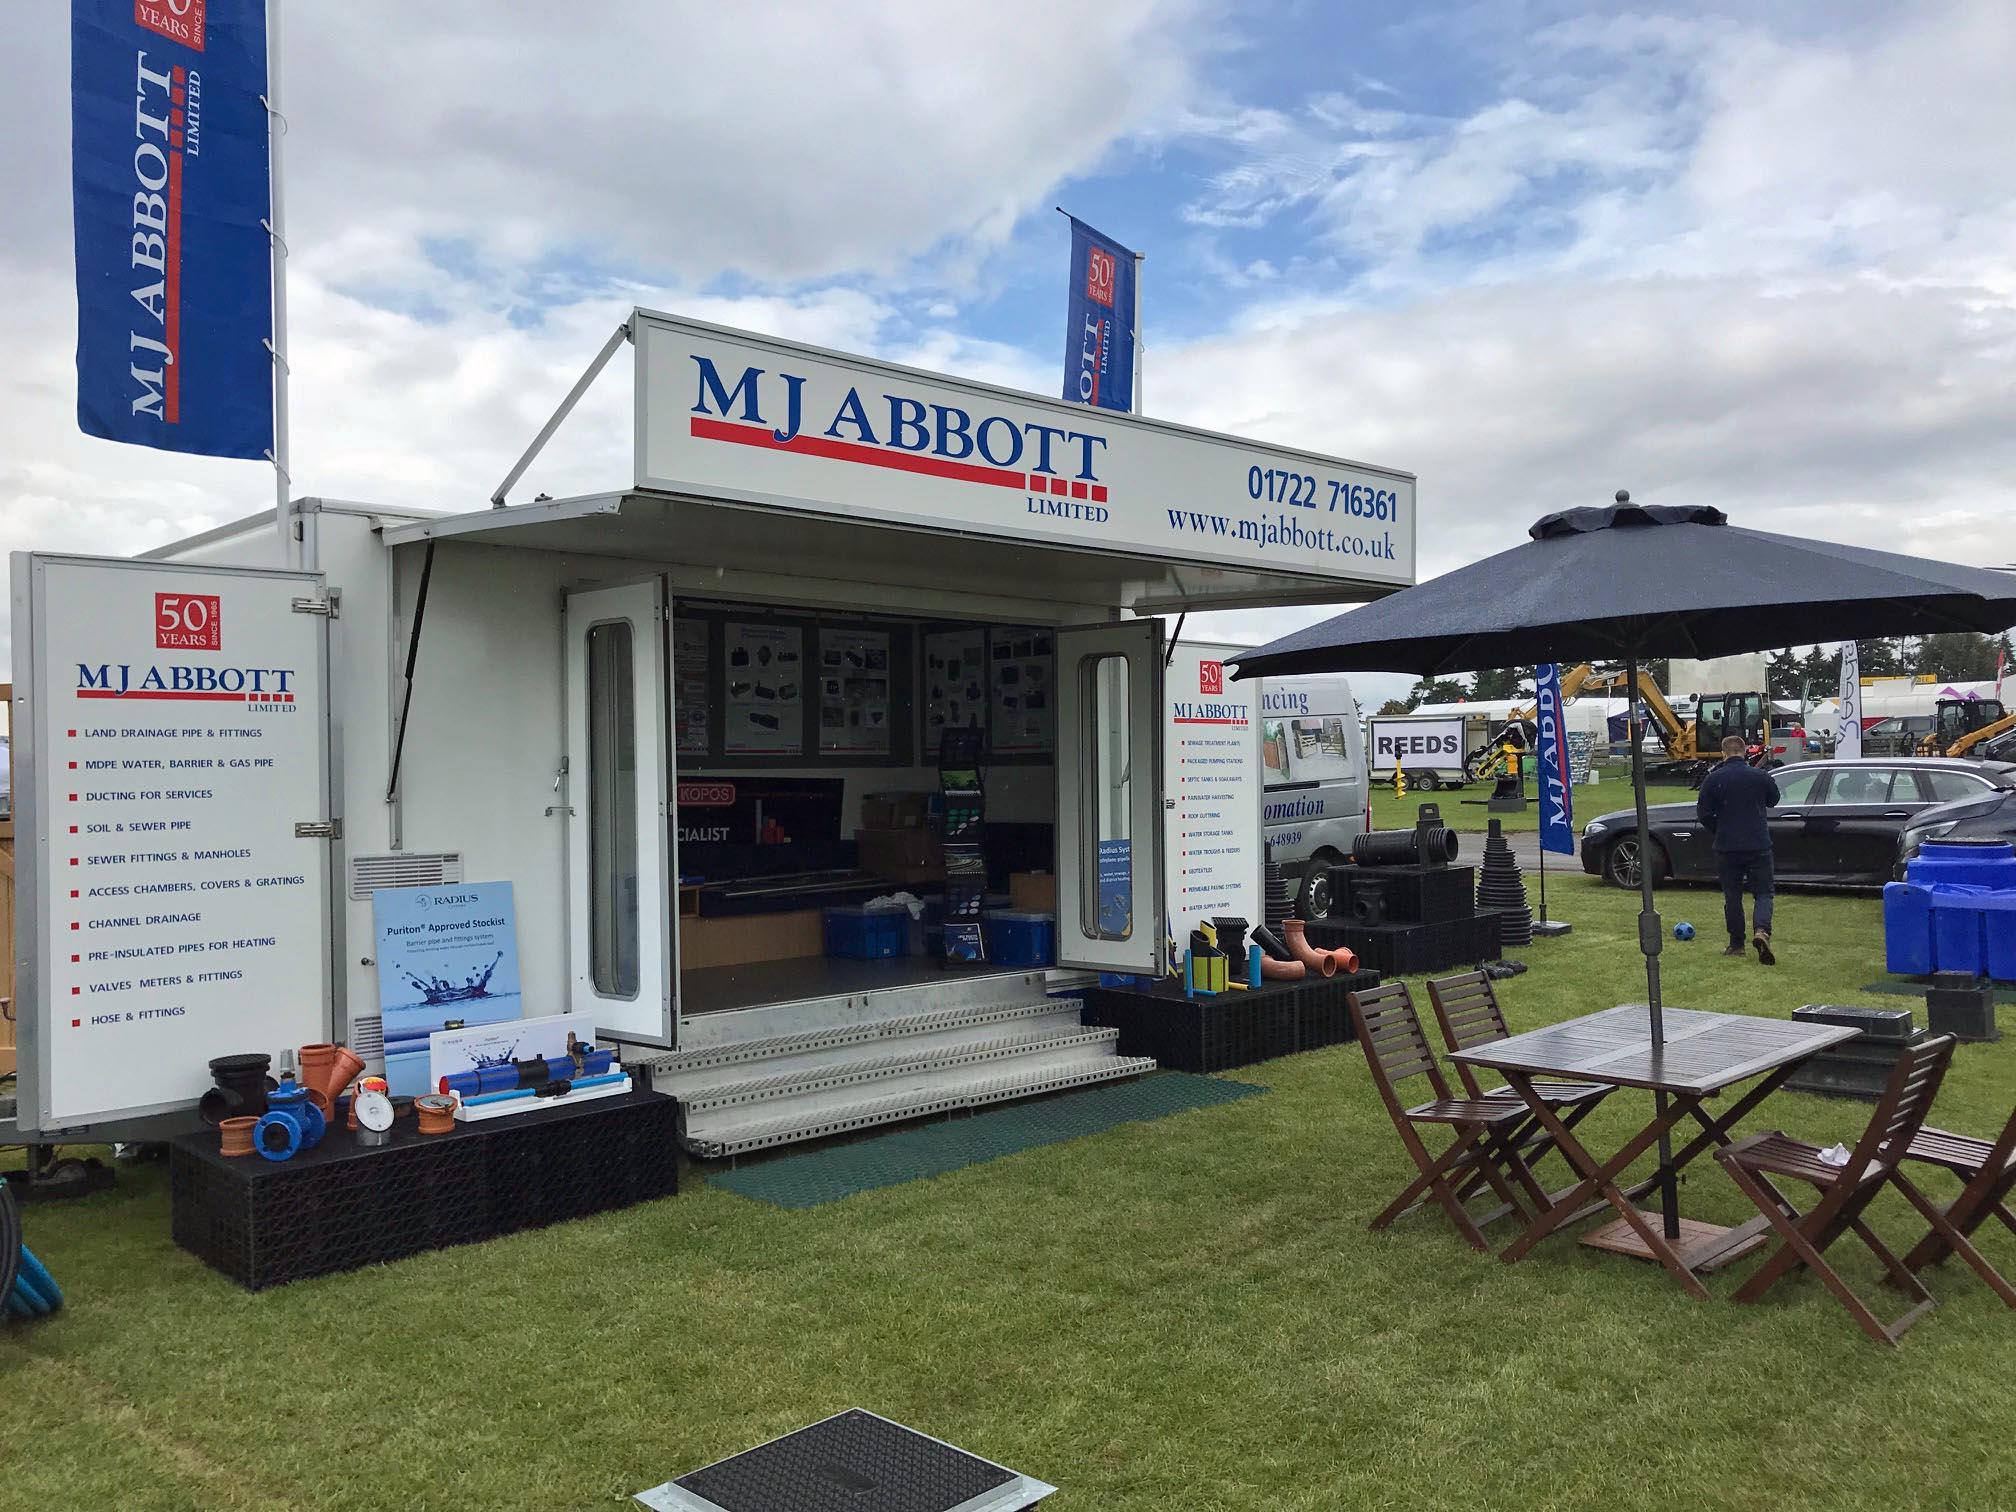 MJ Abbott sales team set for busy summer show season in 2018